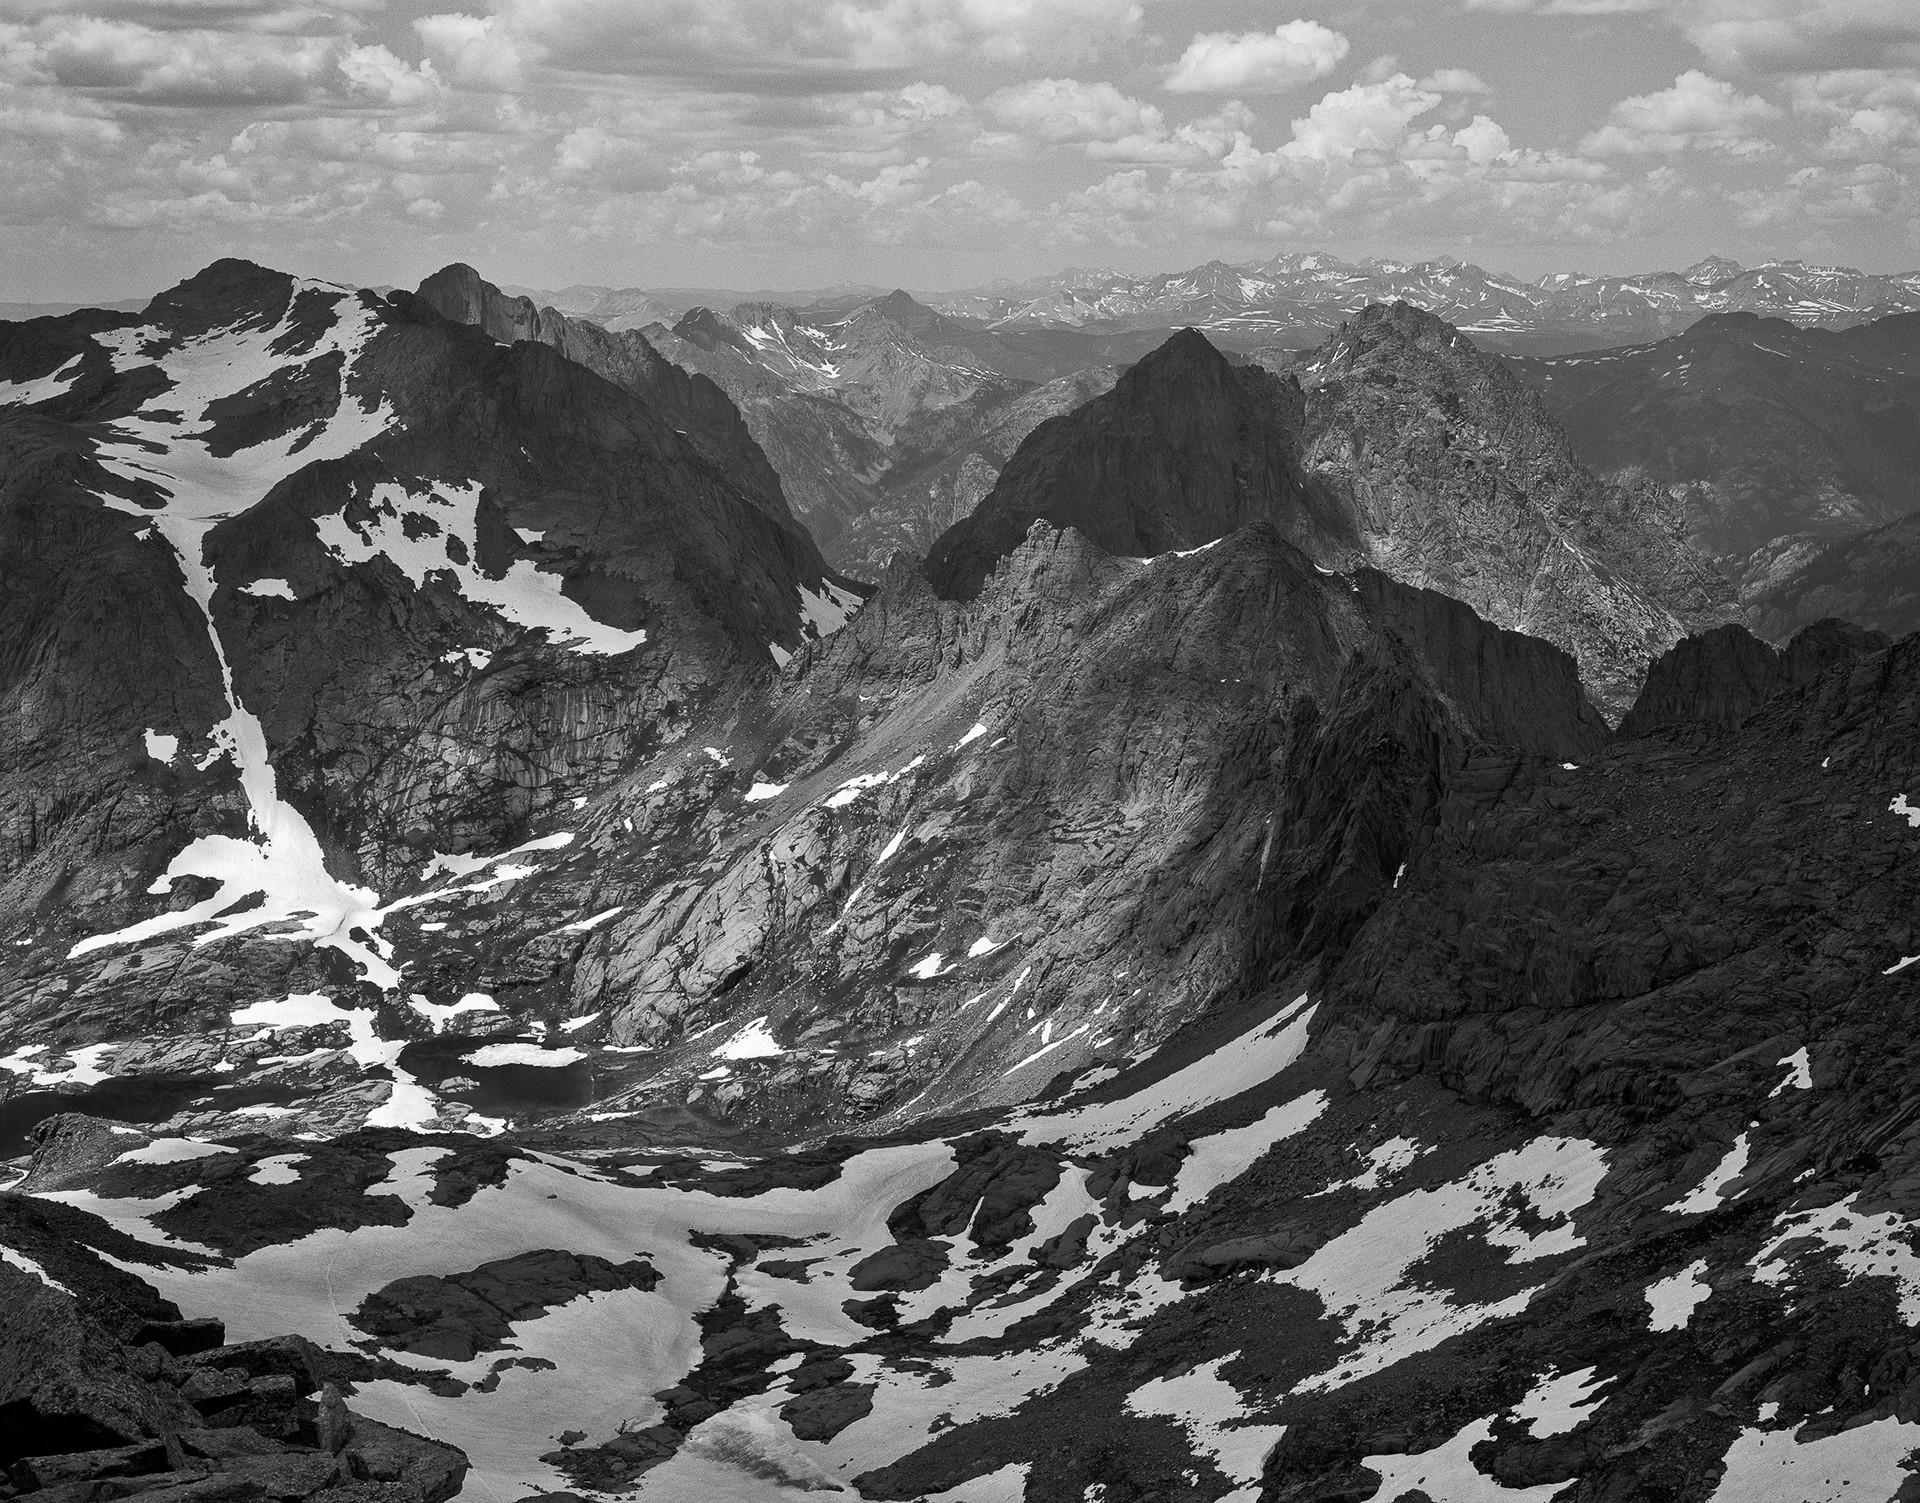 North  Eolus and Monitor Peak